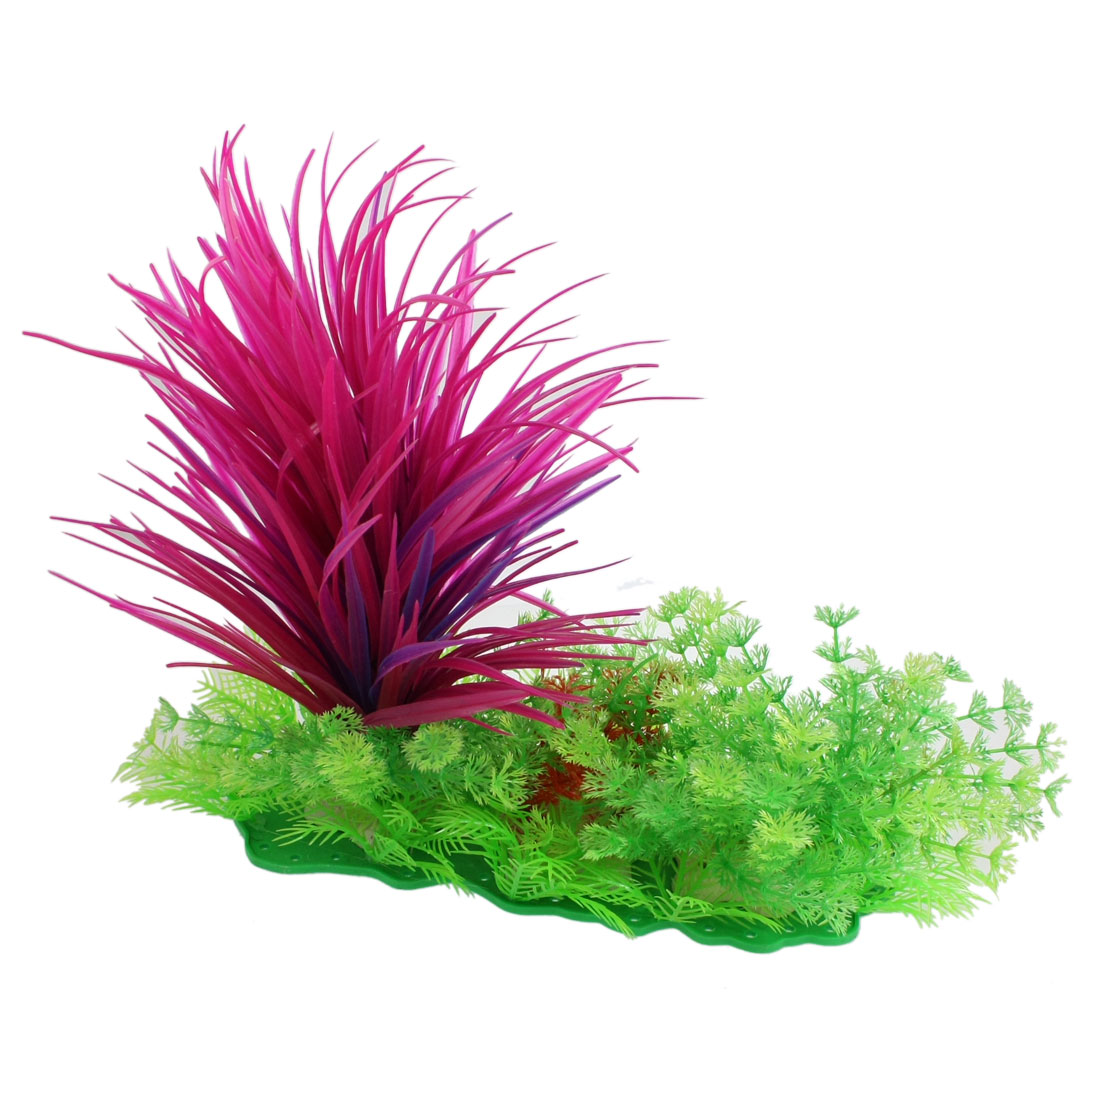 "Aquarium Plastic Fuchsia Long Plants Green Snowflake Grass Decor 11.4"" High"